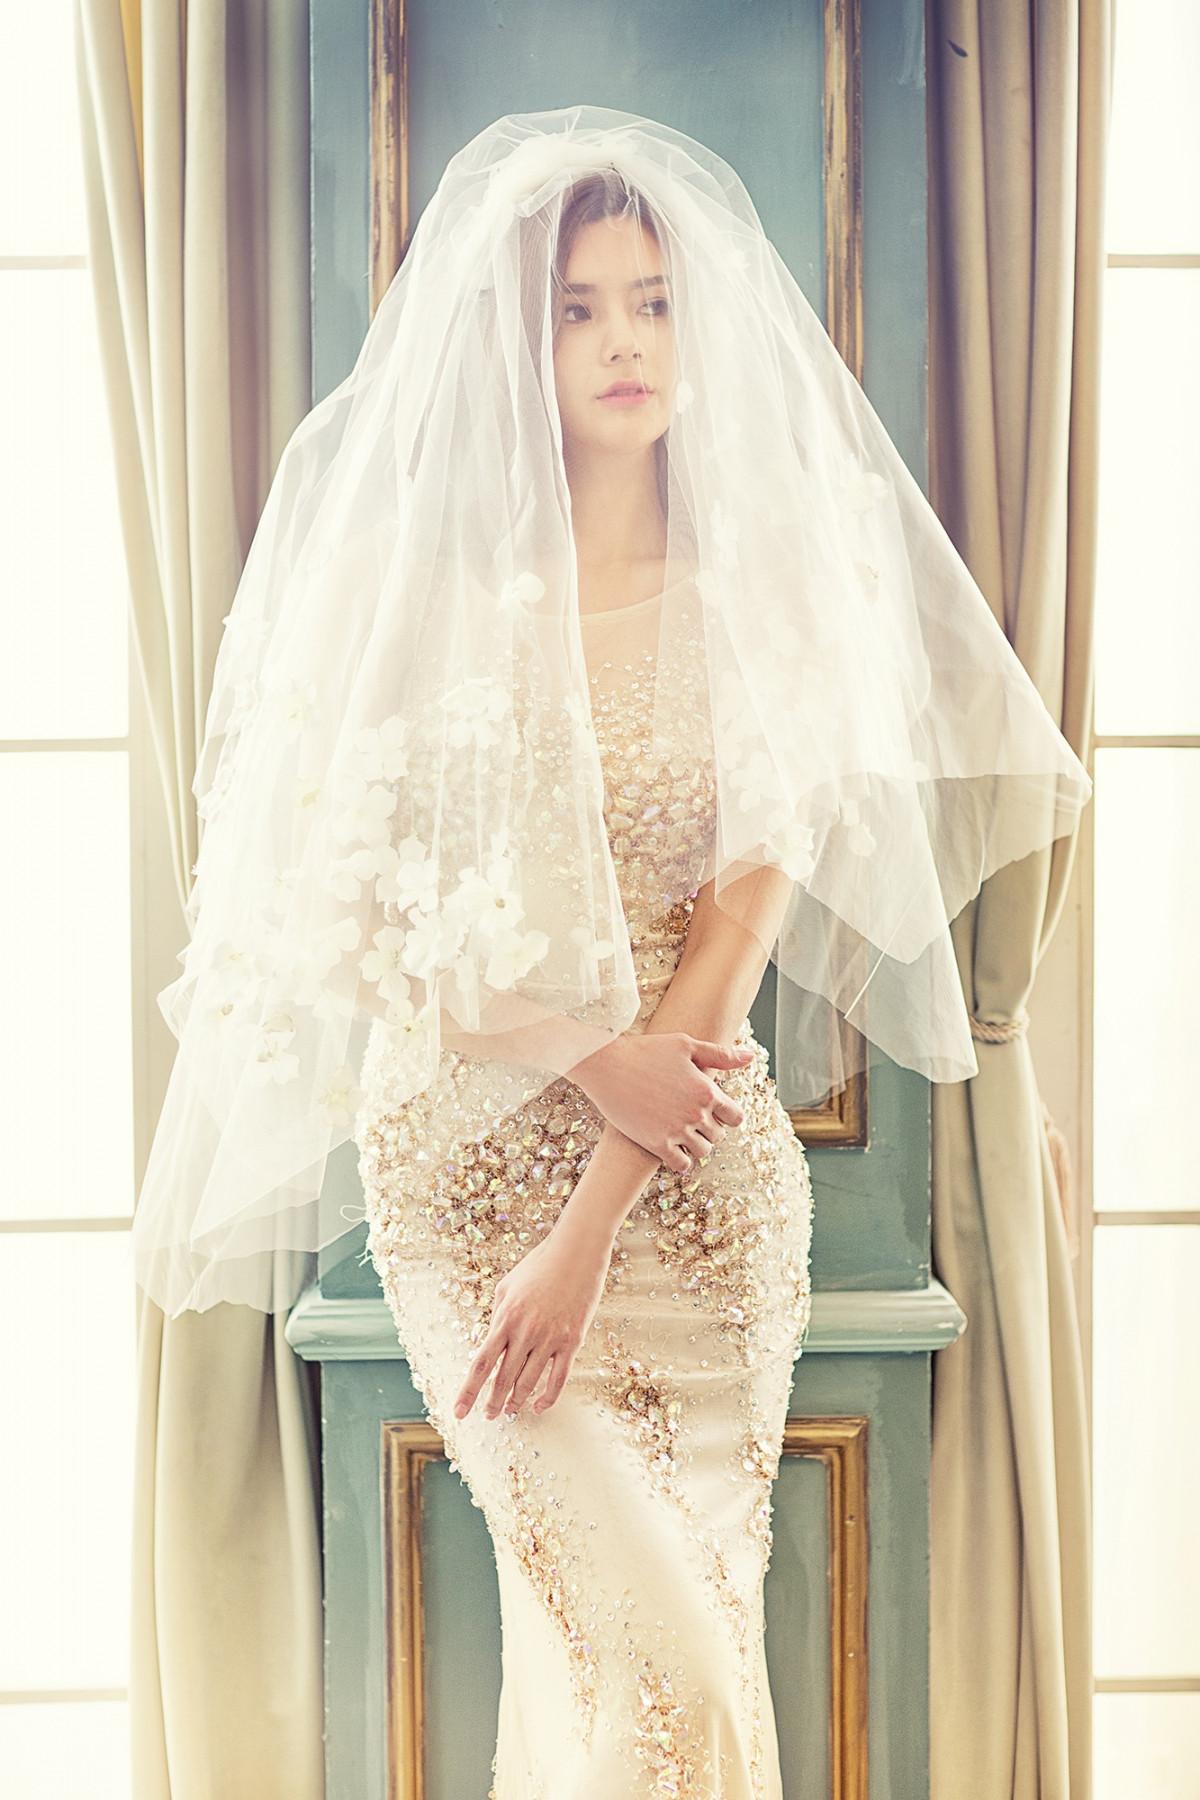 Free images wedding dress bride white dress prayer for Wedding dresses for young brides